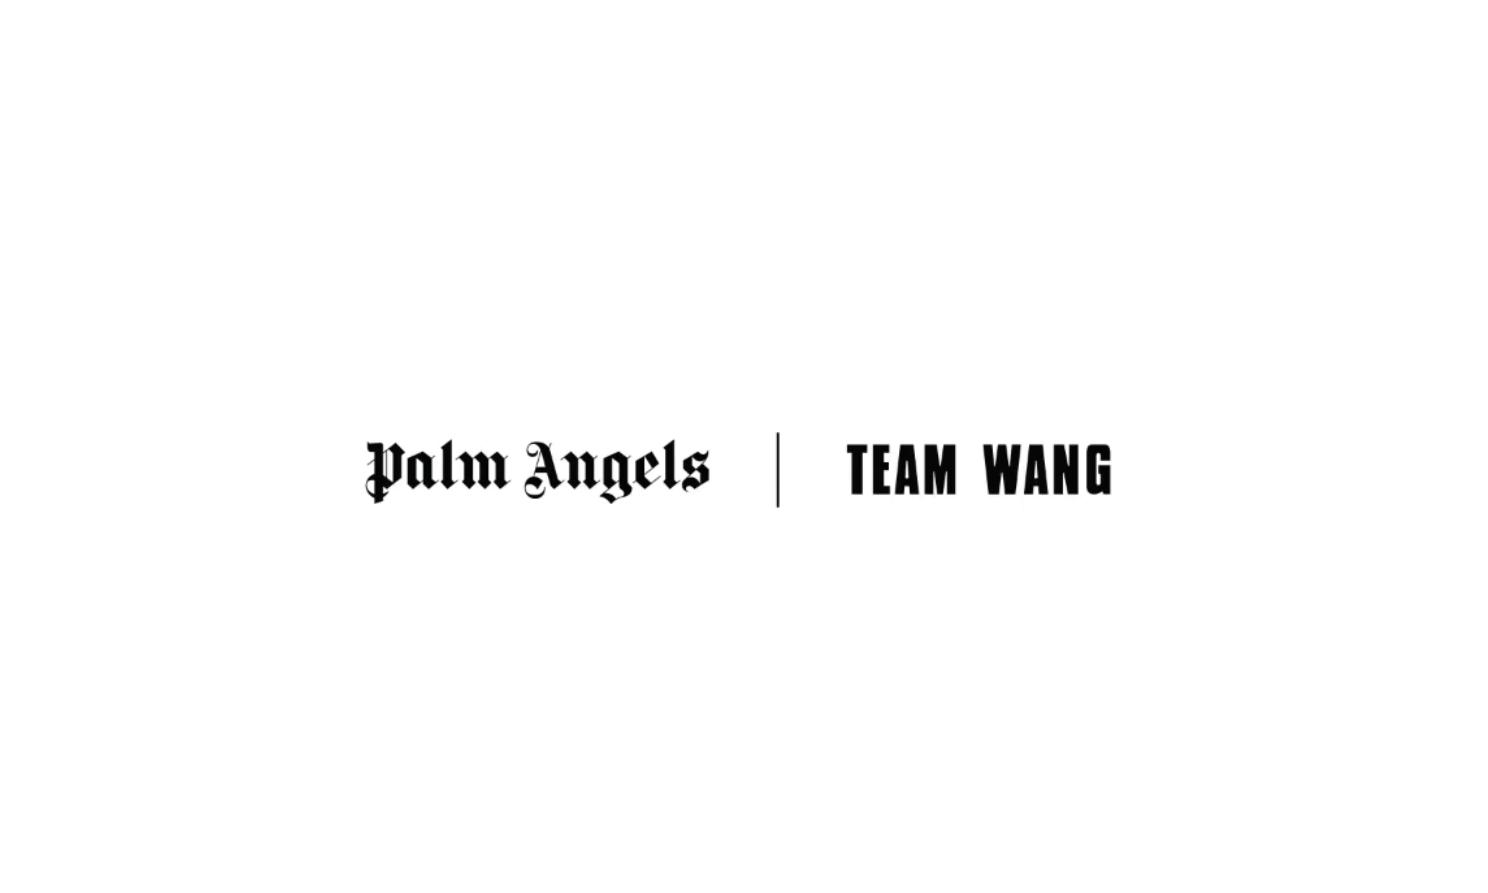 Palm Angels 发布与 TEAM WANG 合作预告